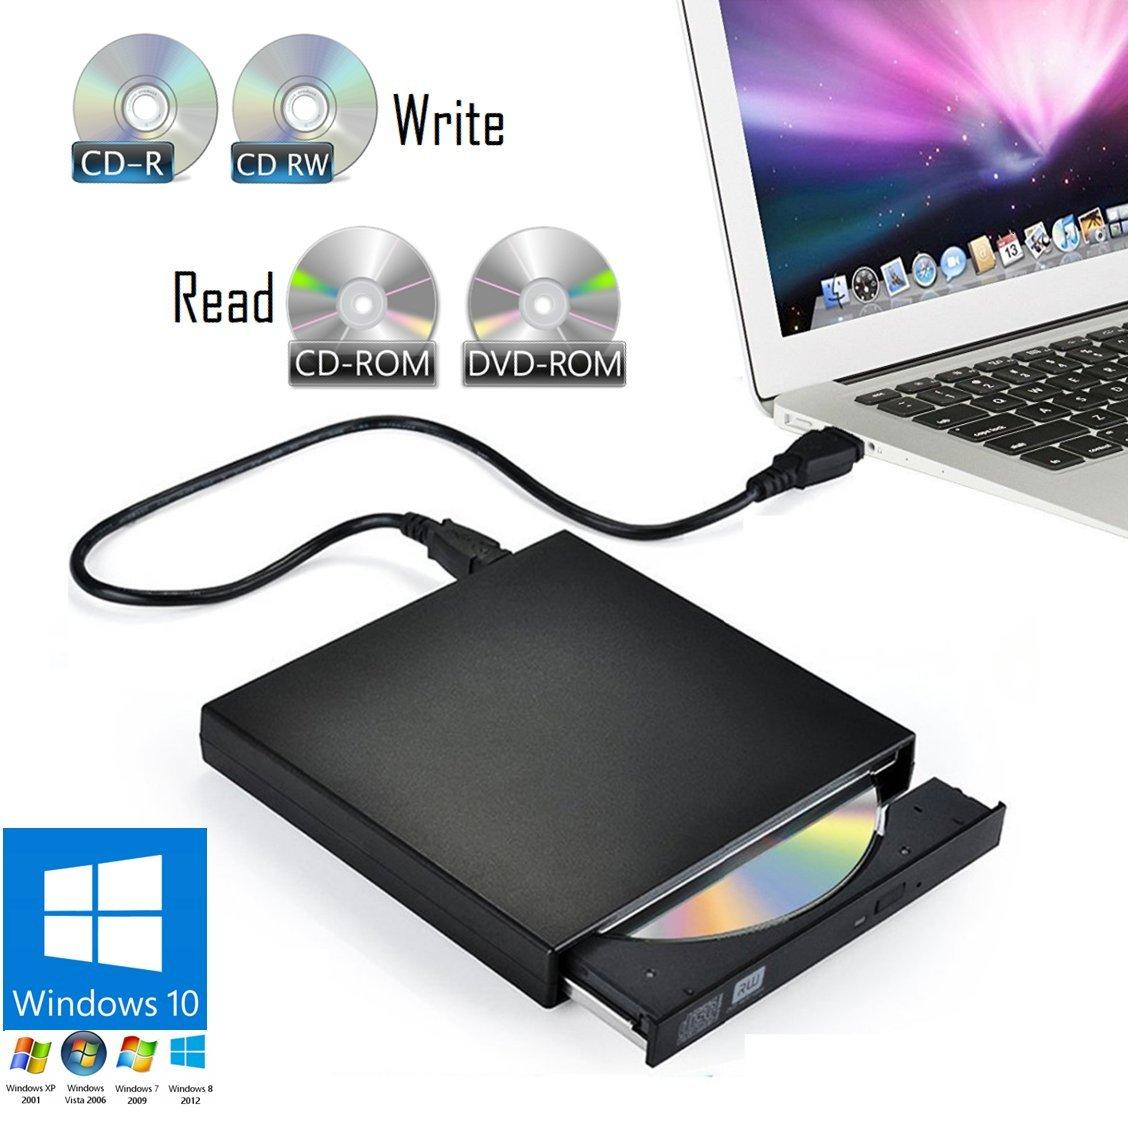 External CD/DVD Drive for Laptop PC & Notebook Windows 10 - USB Optical Slim Combo Writer Burner for CD-R (24x Speed) & CD-RW (8X Speed) – Reader Player for CD-ROM (24x) & DVD-ROM (8X)